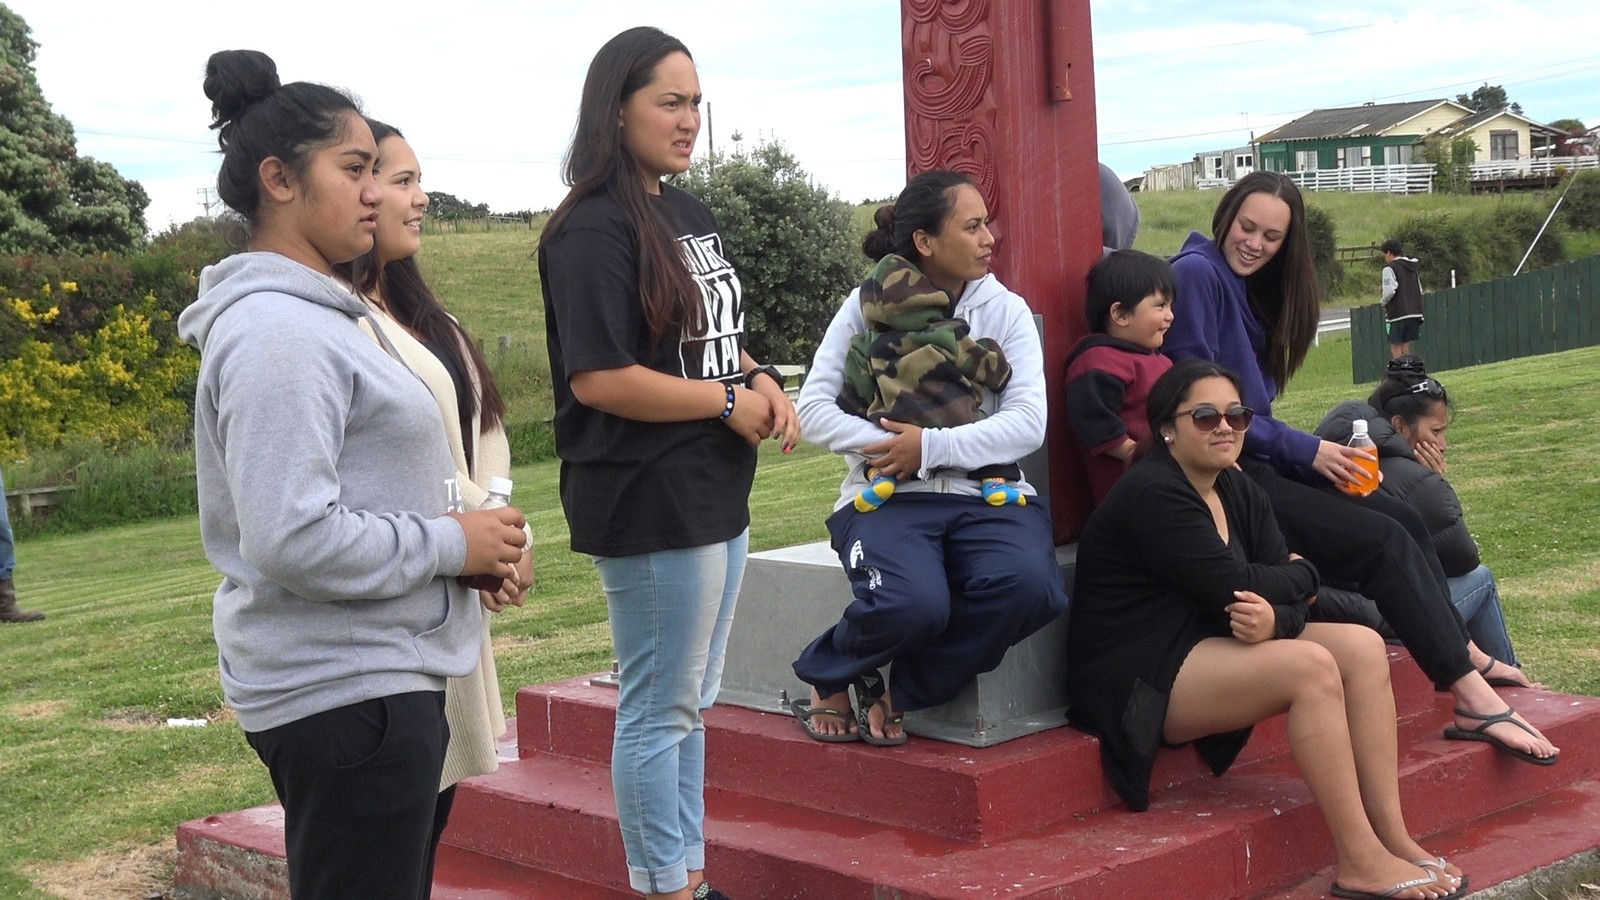 Nuorat báikkálaš maoriaid juovladeaivvadeamis, Te Kaha marae:s (marae lea čearddalaš deaivvadanbáiki). / Unge maorier i Te Kaha, på New Zealand.